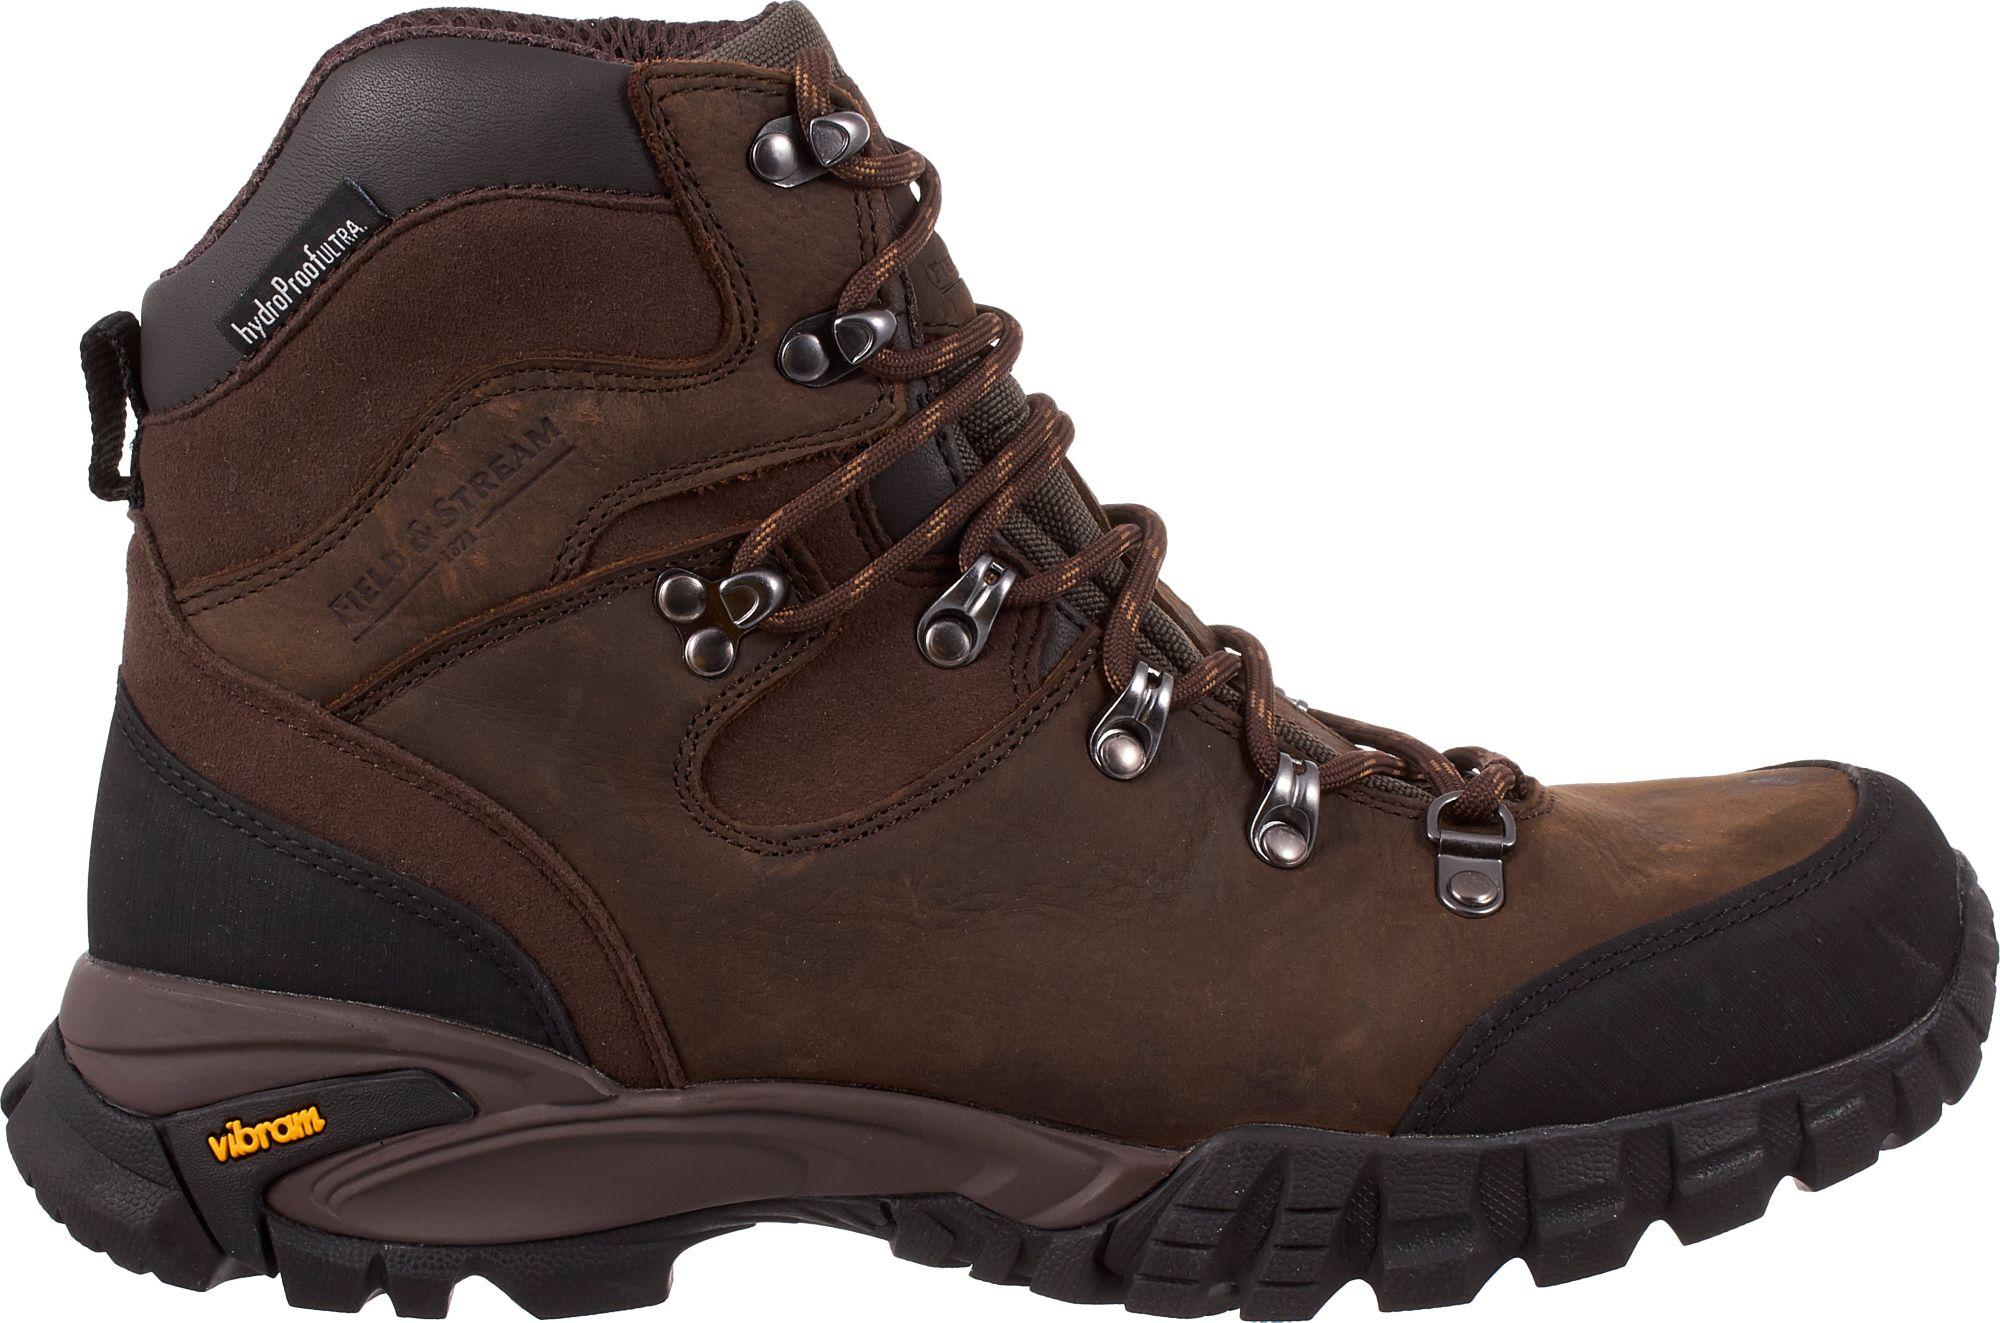 waterproof walking boots field u0026 stream menu0027s deep creek waterproof hiking boots | dicku0027s sporting  goods YIRECFX